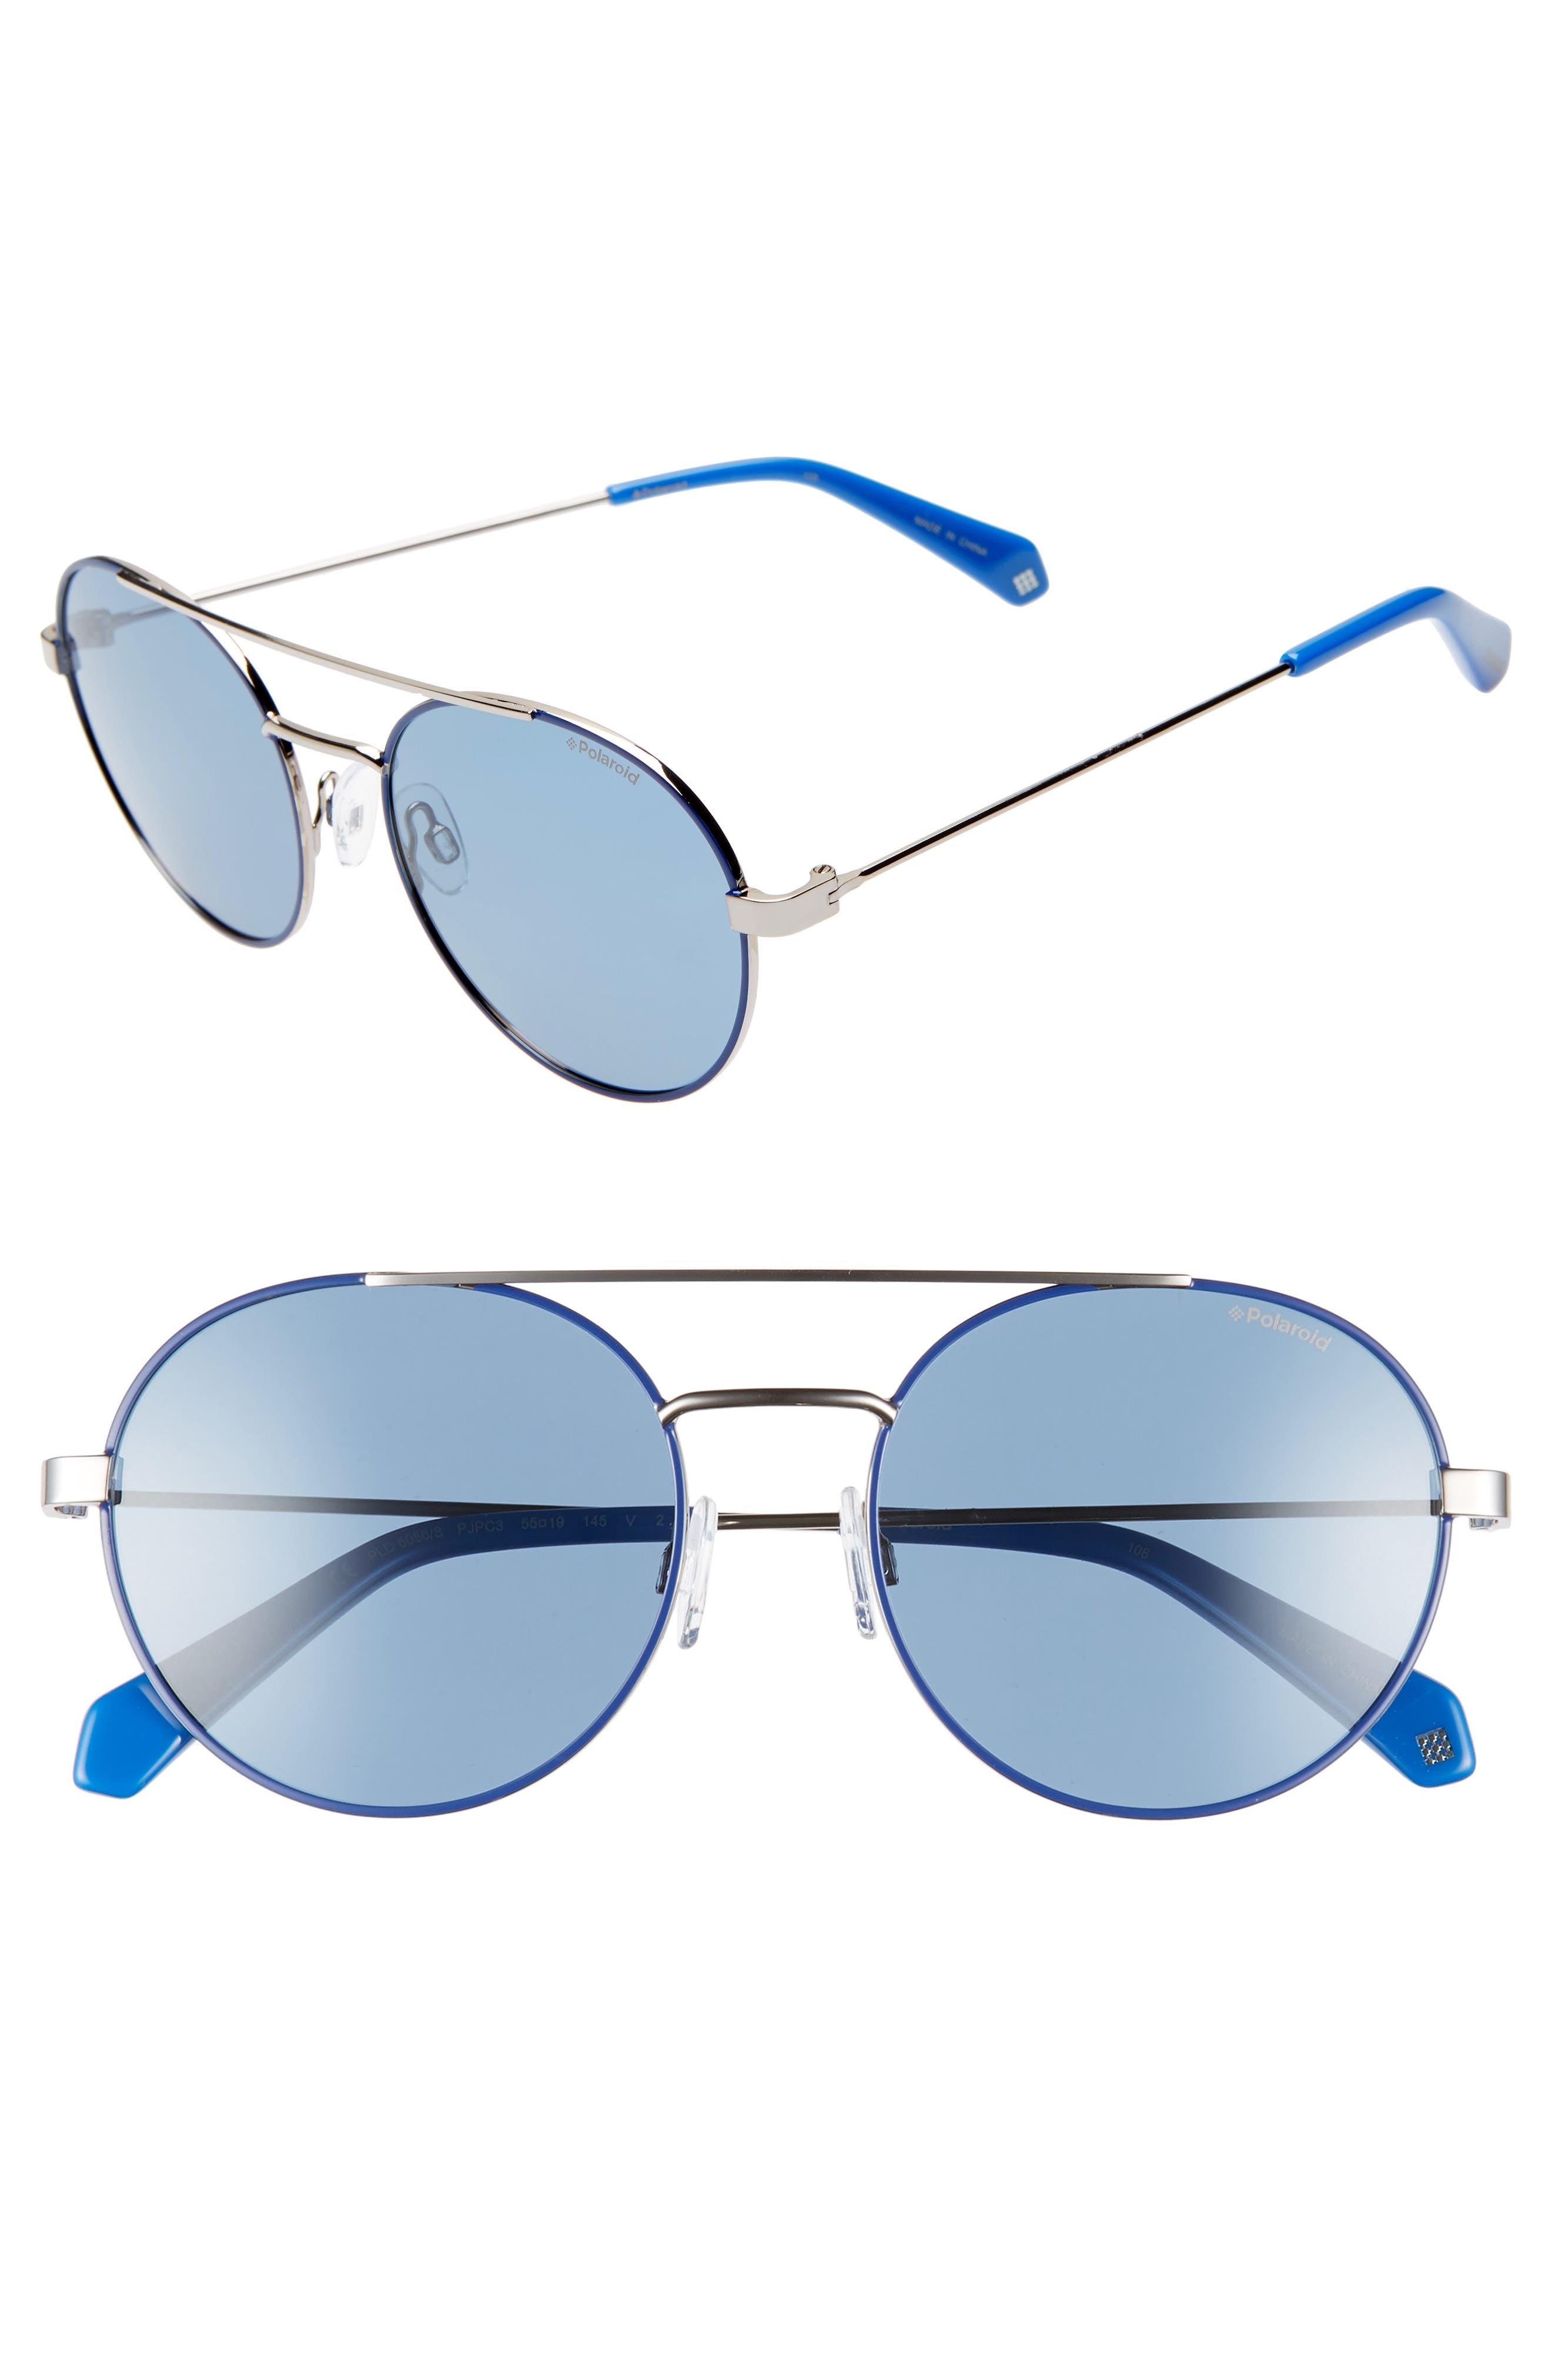 Polaroid 55Mm Polarized Round Aviator Sunglasses - Blue/ Silver